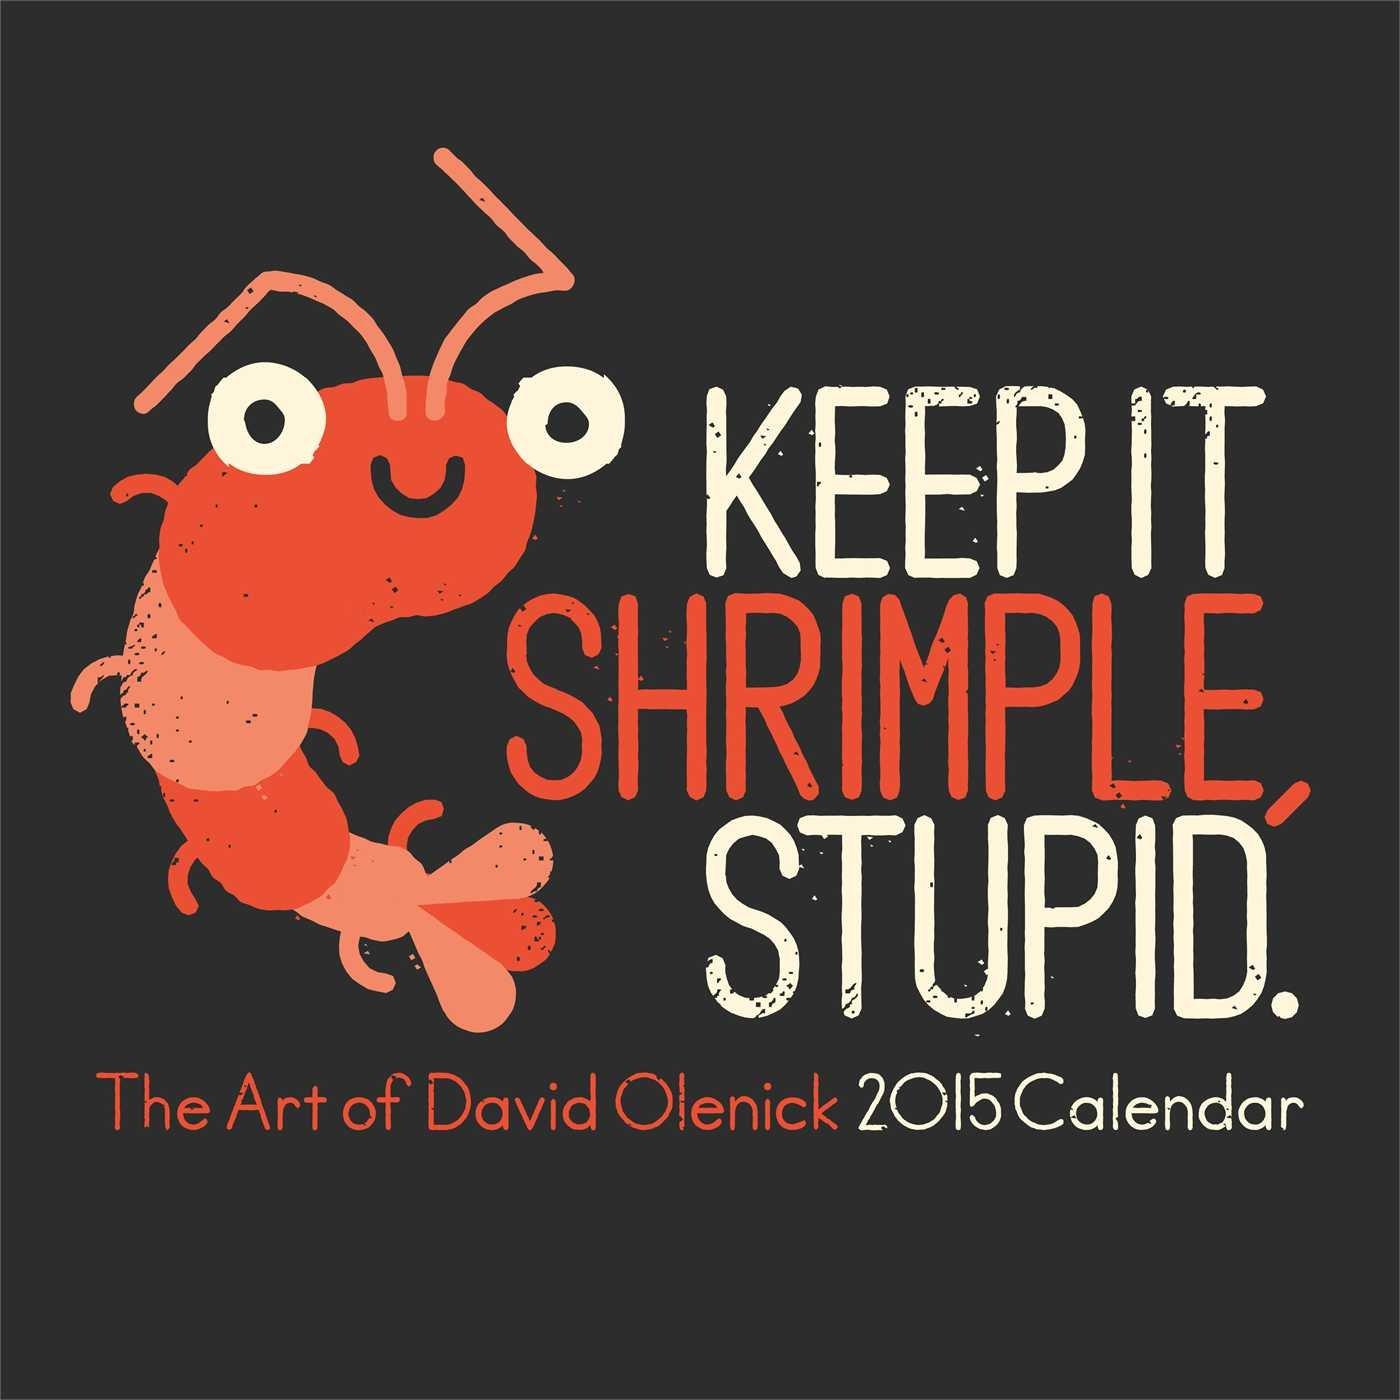 Keep It Shrimple, Stupid: The Art of David Olenick 2015 Wall Calendar: David  Olenick: 9781449453923: Amazon.com: Books